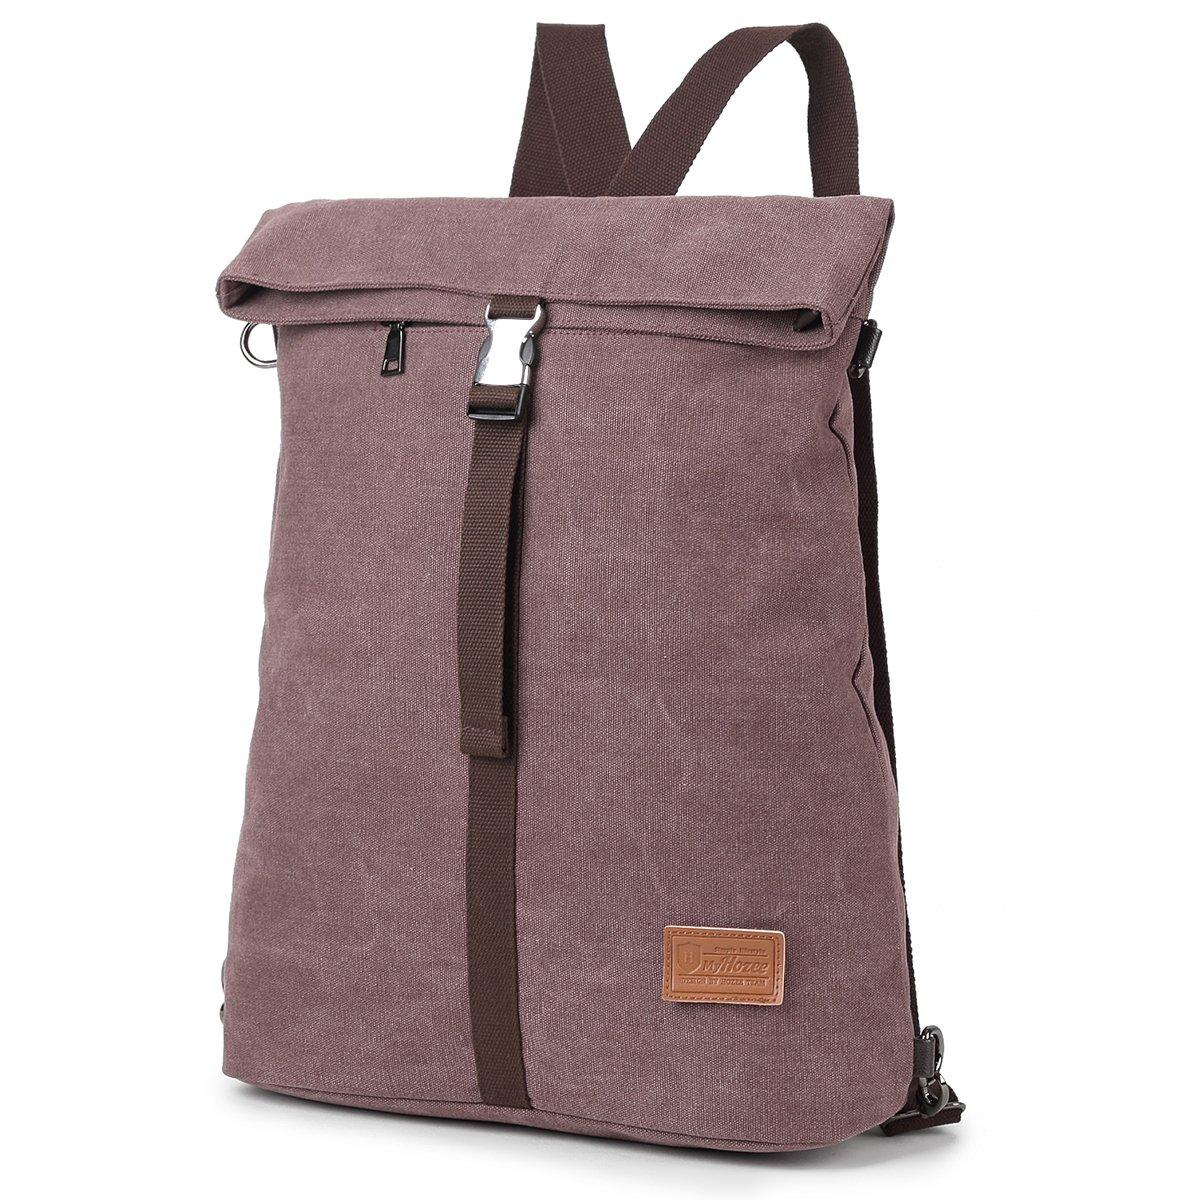 Travistar Women Canvas Rucksack Anti Theft Backpack Purse for School/Travel Multipurpose Daypack